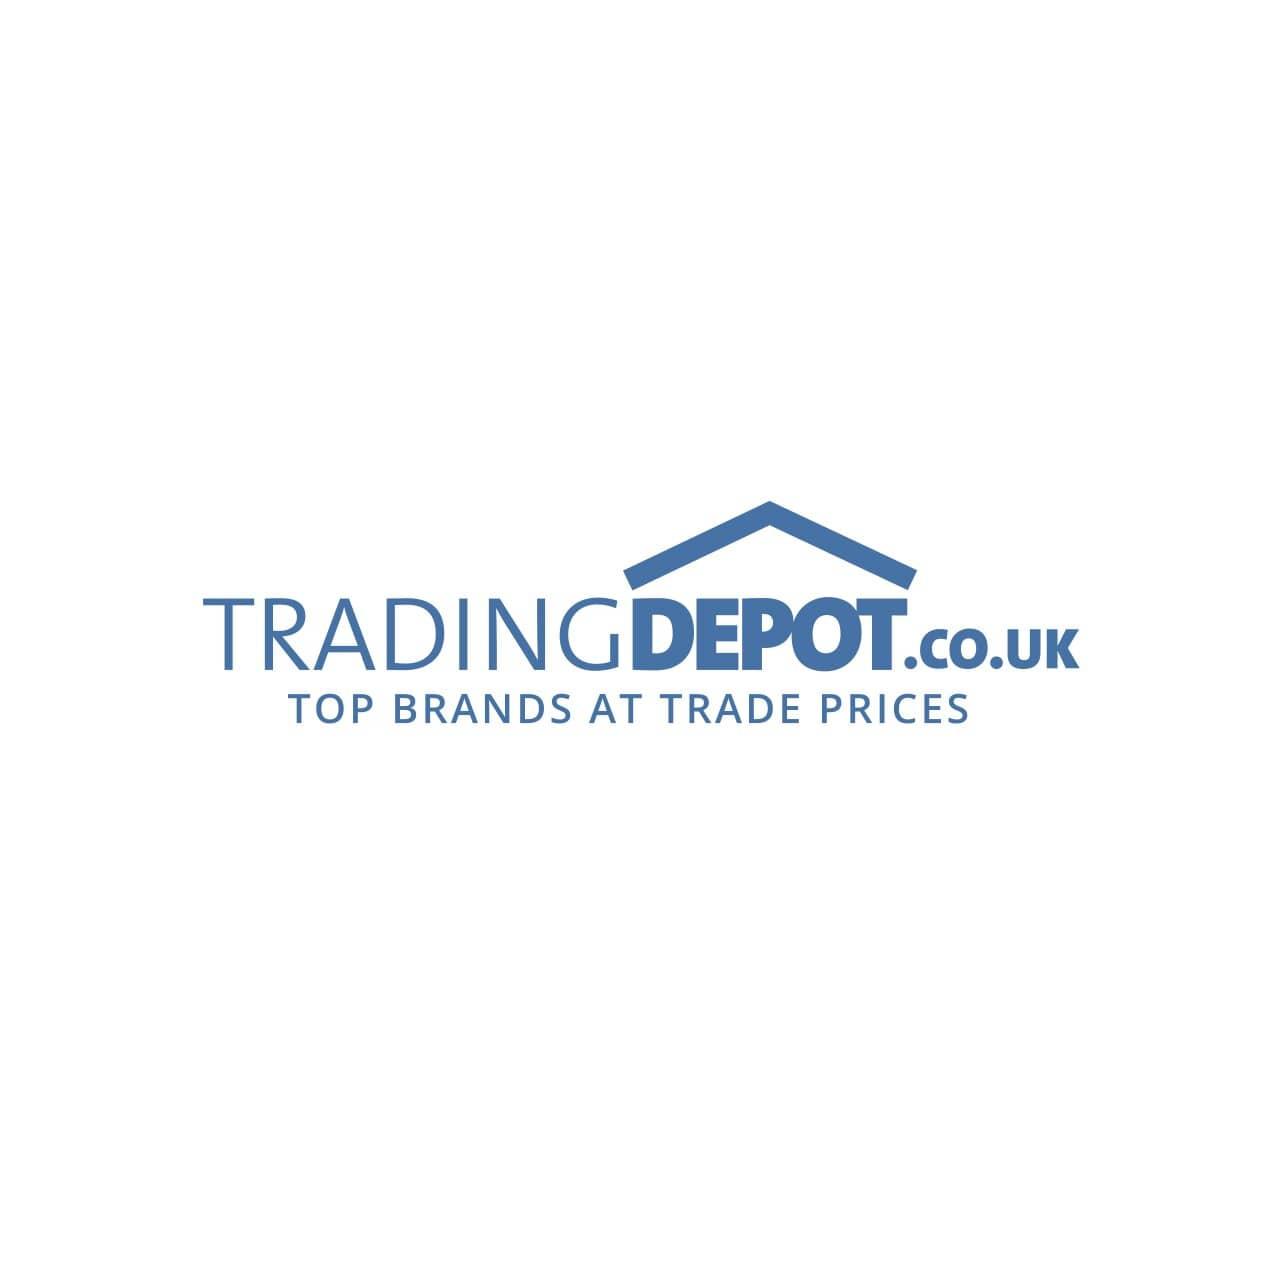 Ideal Standard Basin Wall Fixing Kit (To Suit Jasper Morrison,Tempo & Studio Echo 50-60cm Basins) - E015767